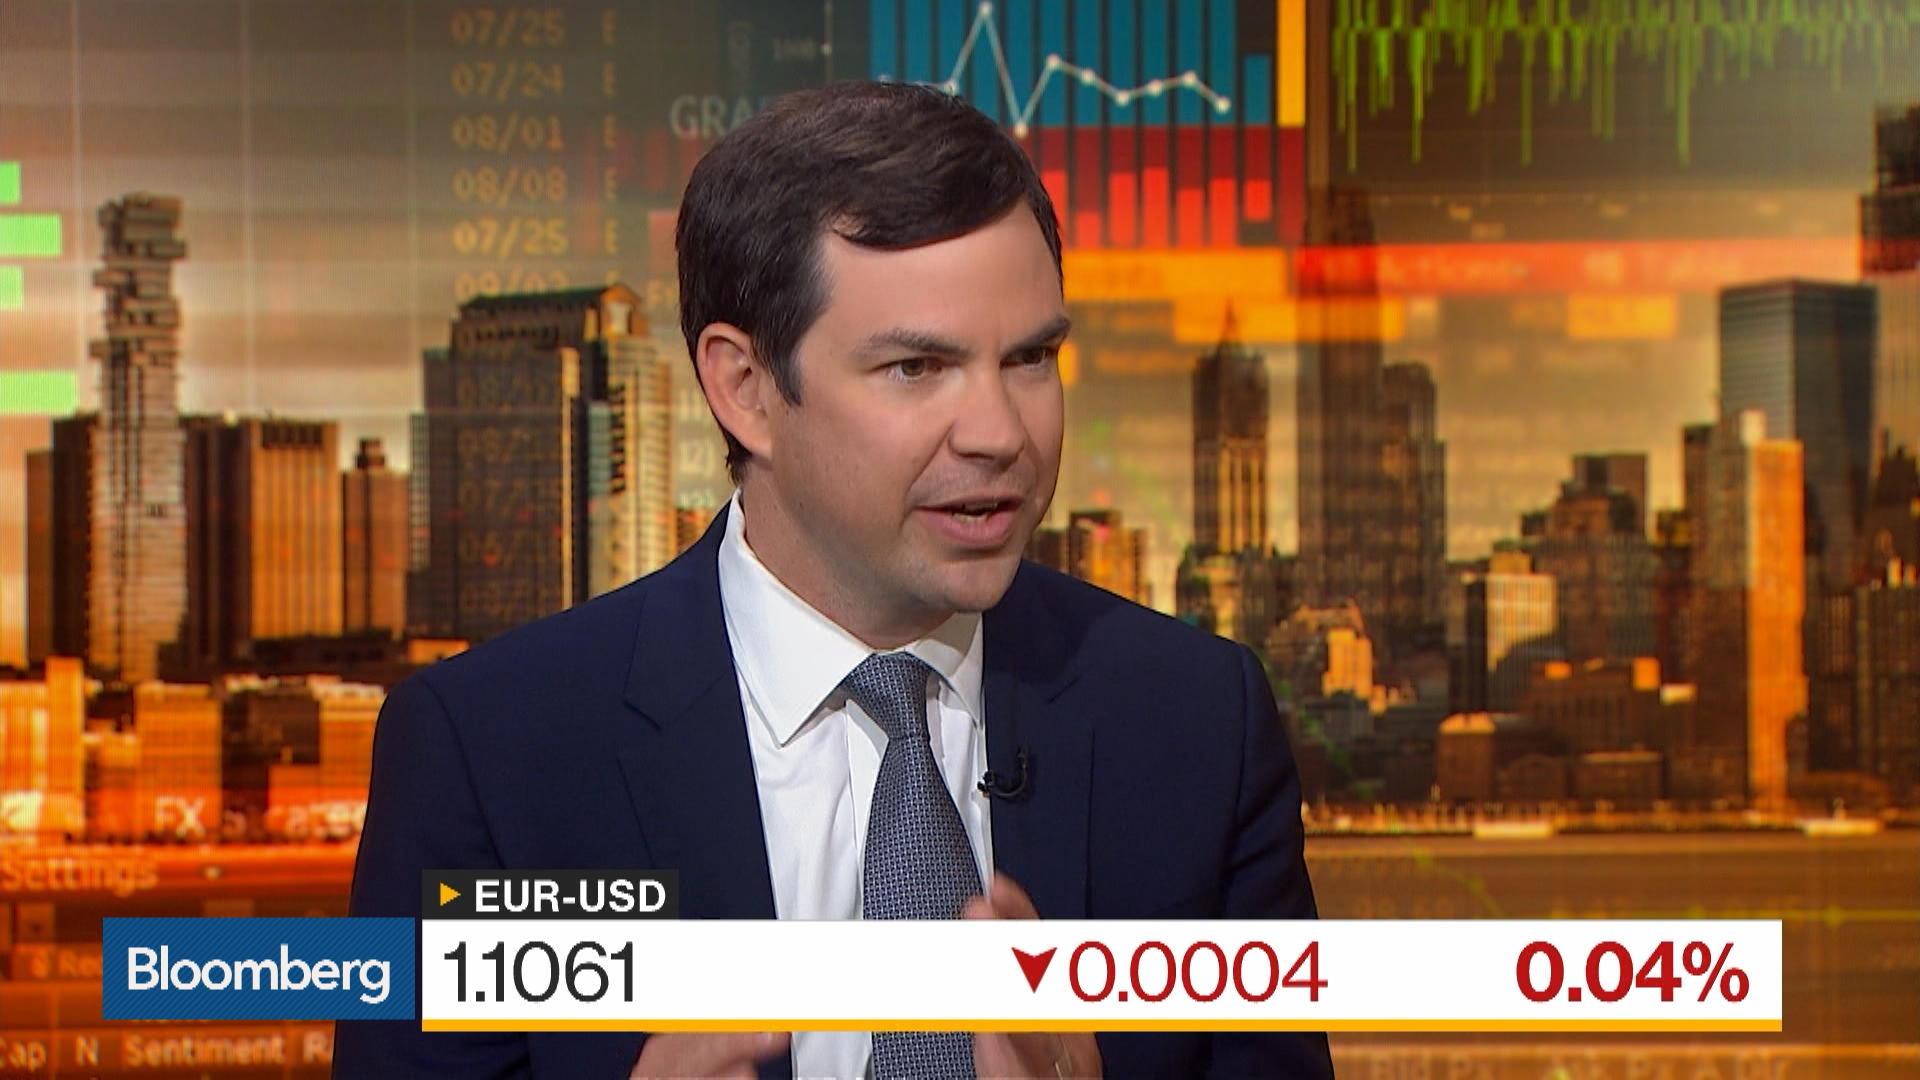 Zach Pandl, Strategist at Goldman Sachs, on Currencies